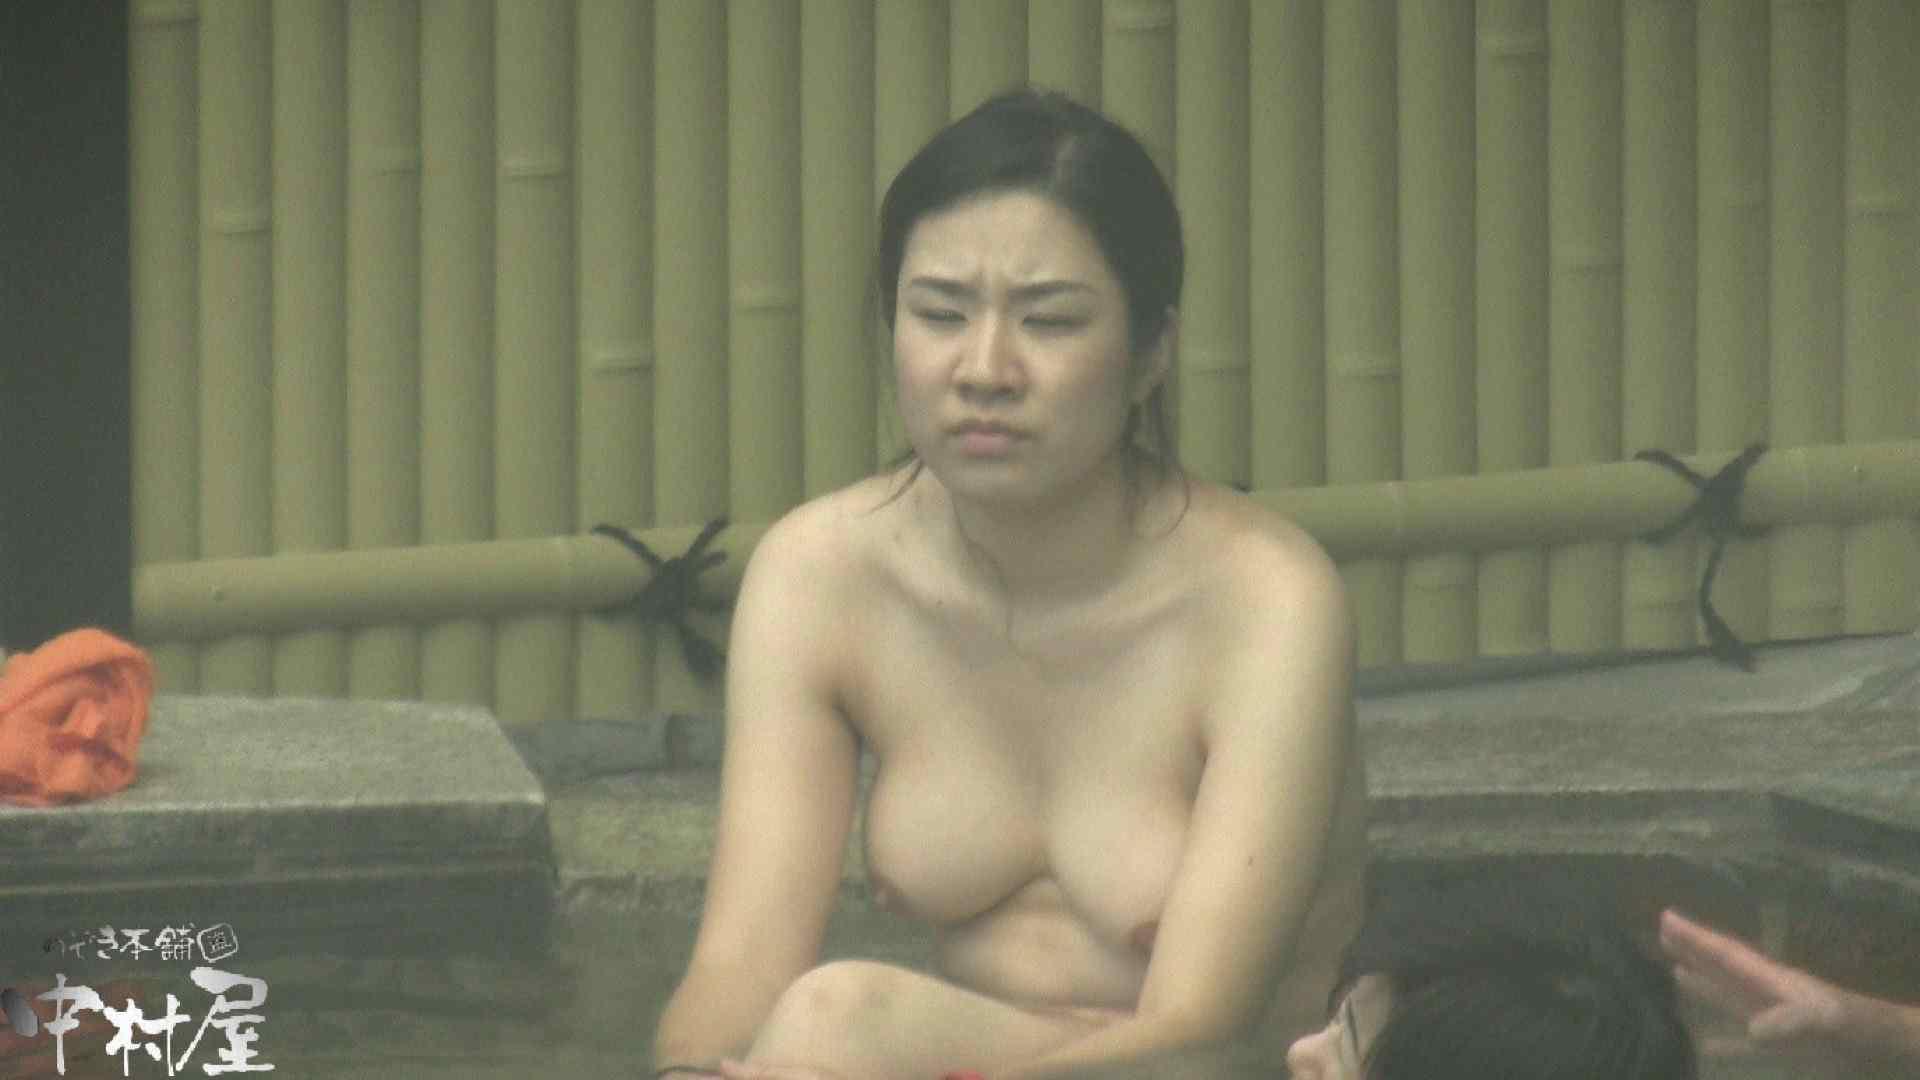 Aquaな露天風呂Vol.913 OLのエロ生活 すけべAV動画紹介 68連発 35